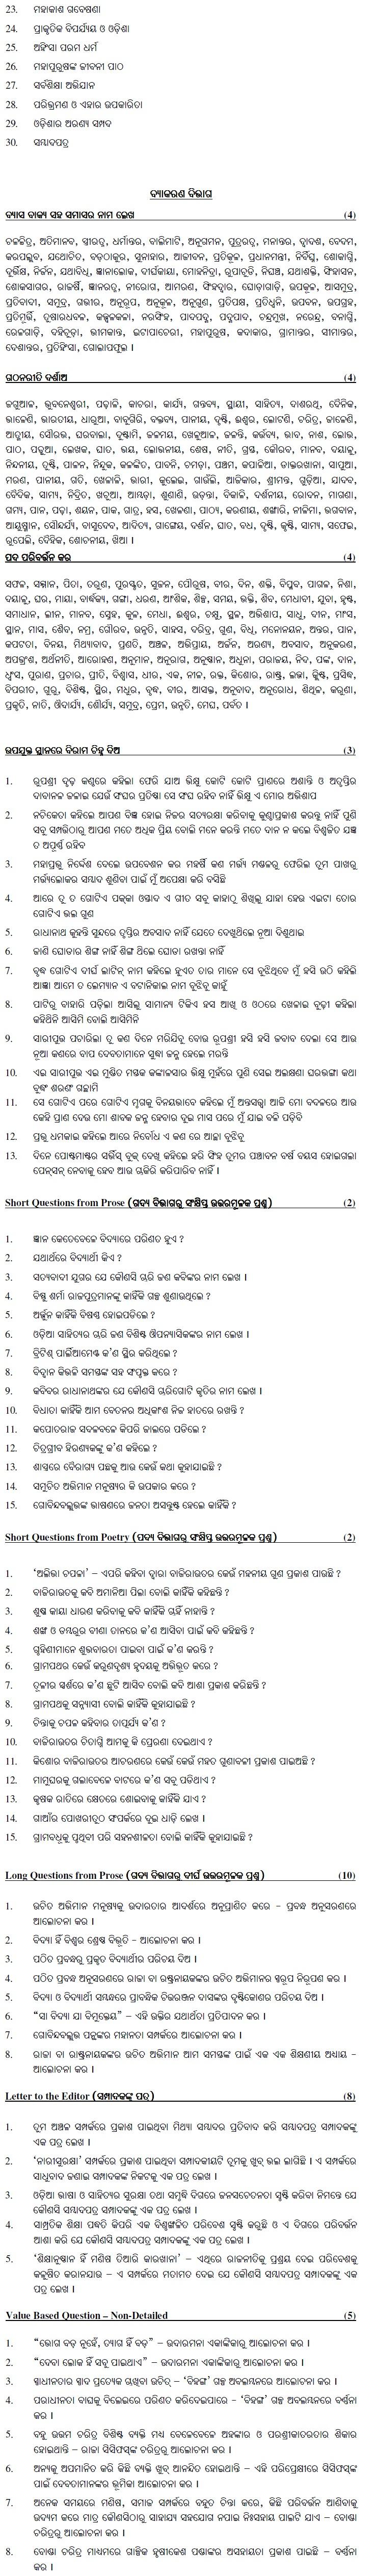 CBSE Class 10 Question Bank - Odia